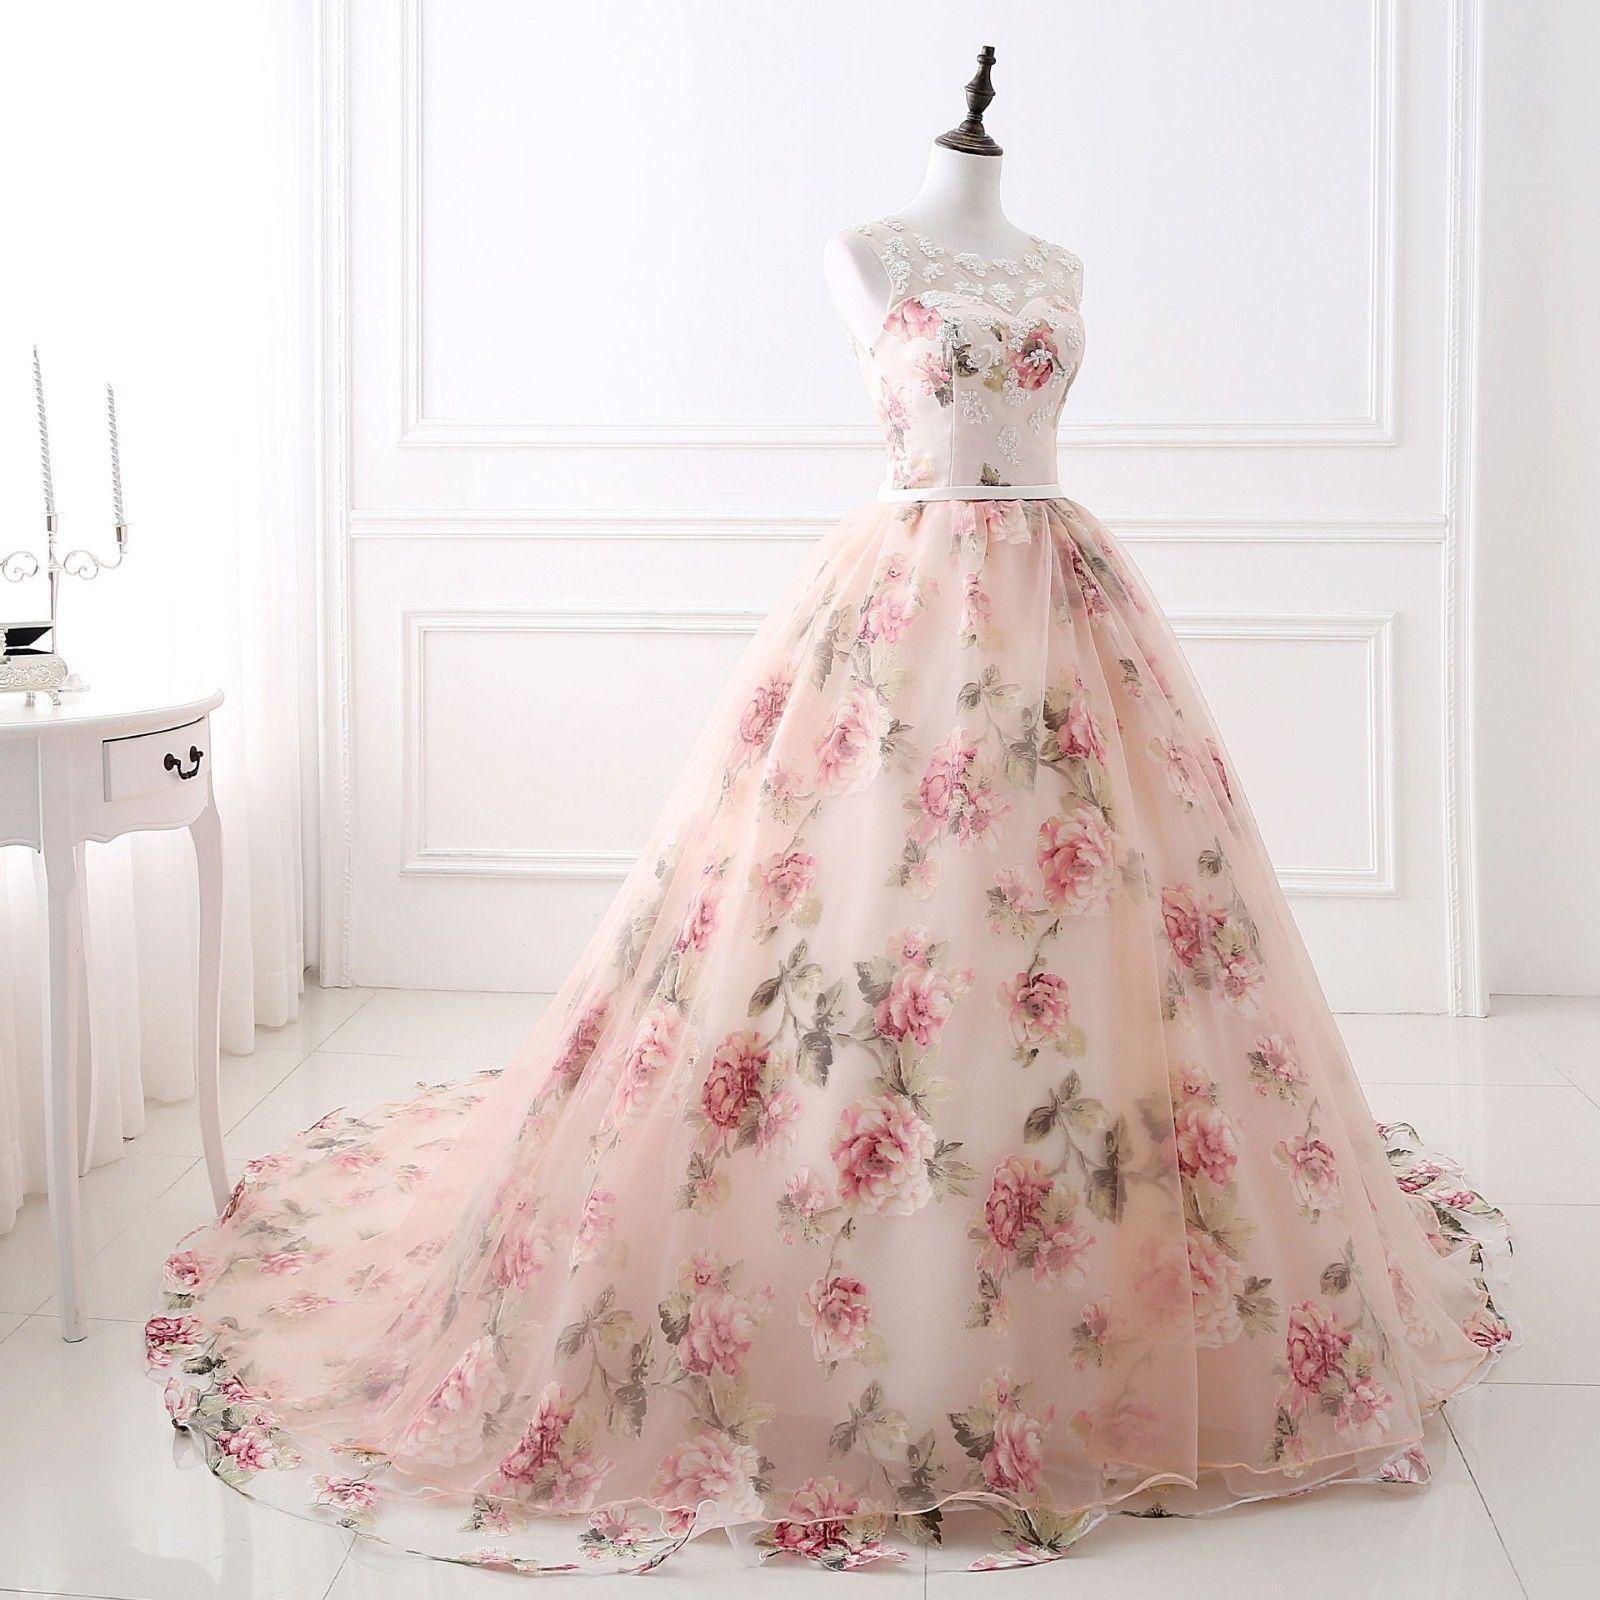 Beautiful Flower Print Floral Wedding Dress Princess Lace Pink Bridal Ball Gown Wedding Dress Ideas Bridal Ball Gown Floral Dress Formal Pink Prom Dresses